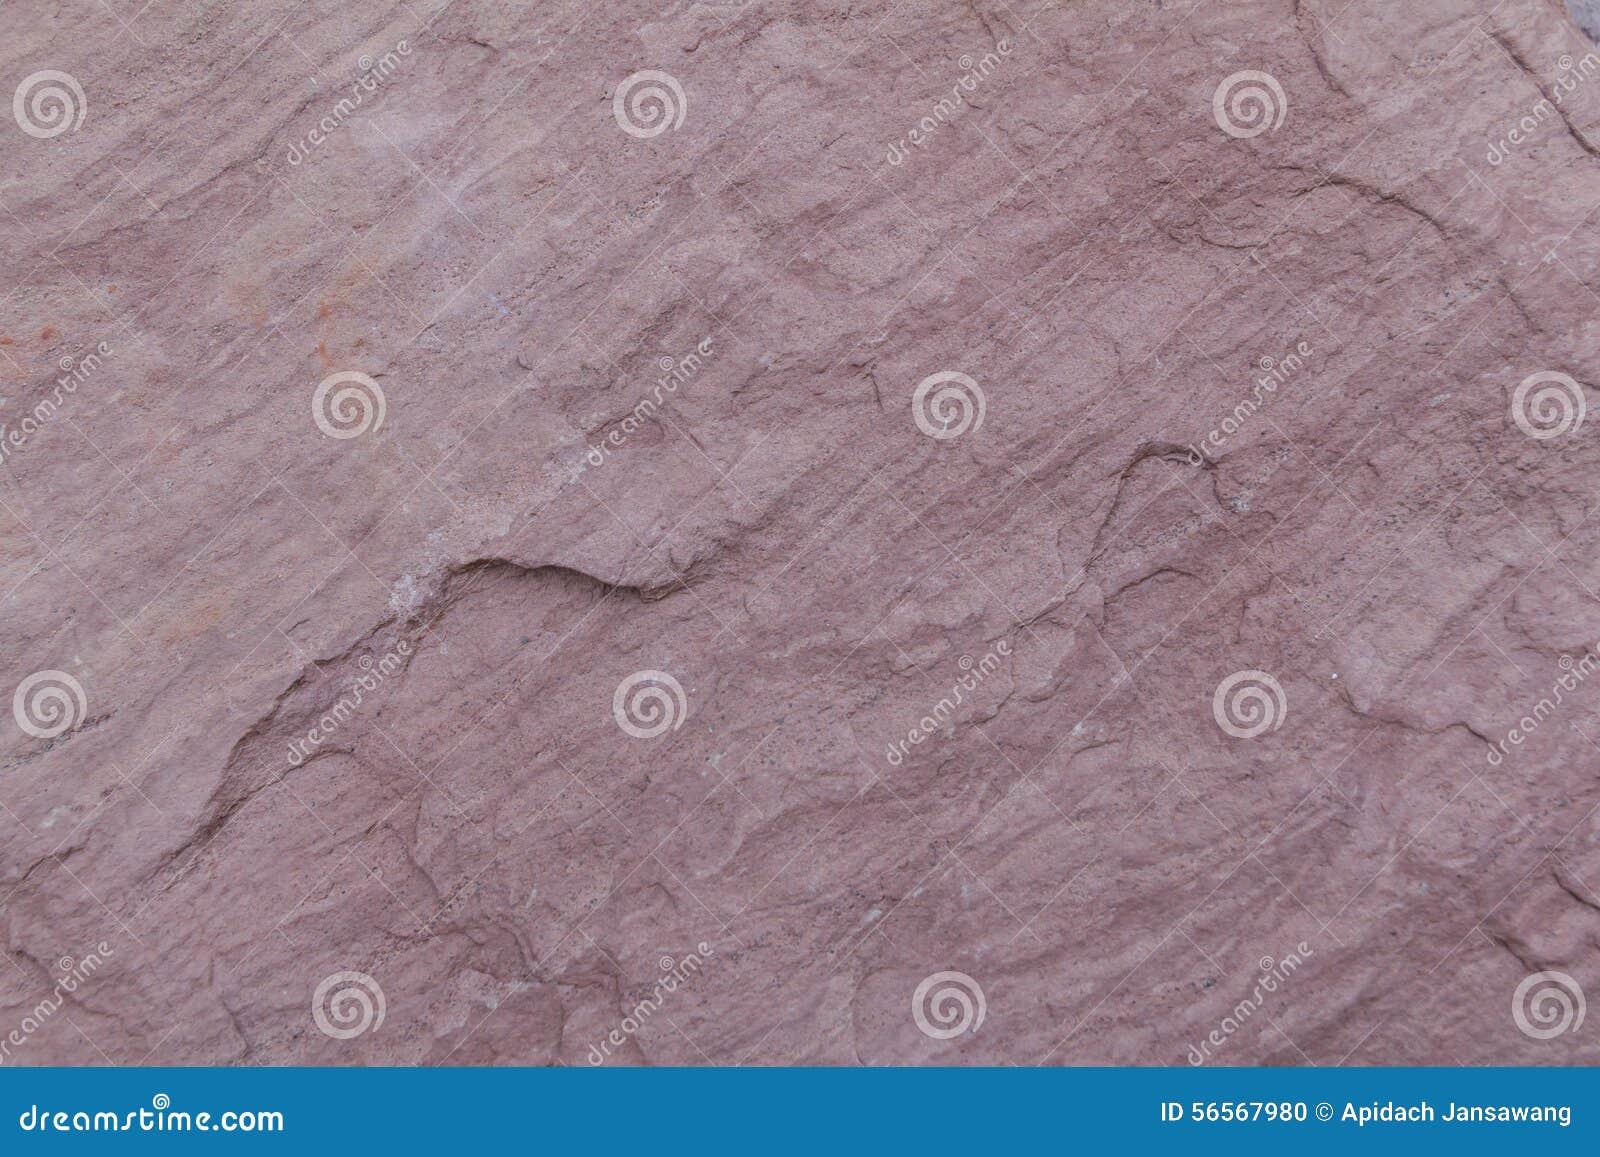 Download Laterite επιφάνεια πετρών για το υπόβαθρο Στοκ Εικόνες - εικόνα από χαλίκι, λάσπη: 56567980